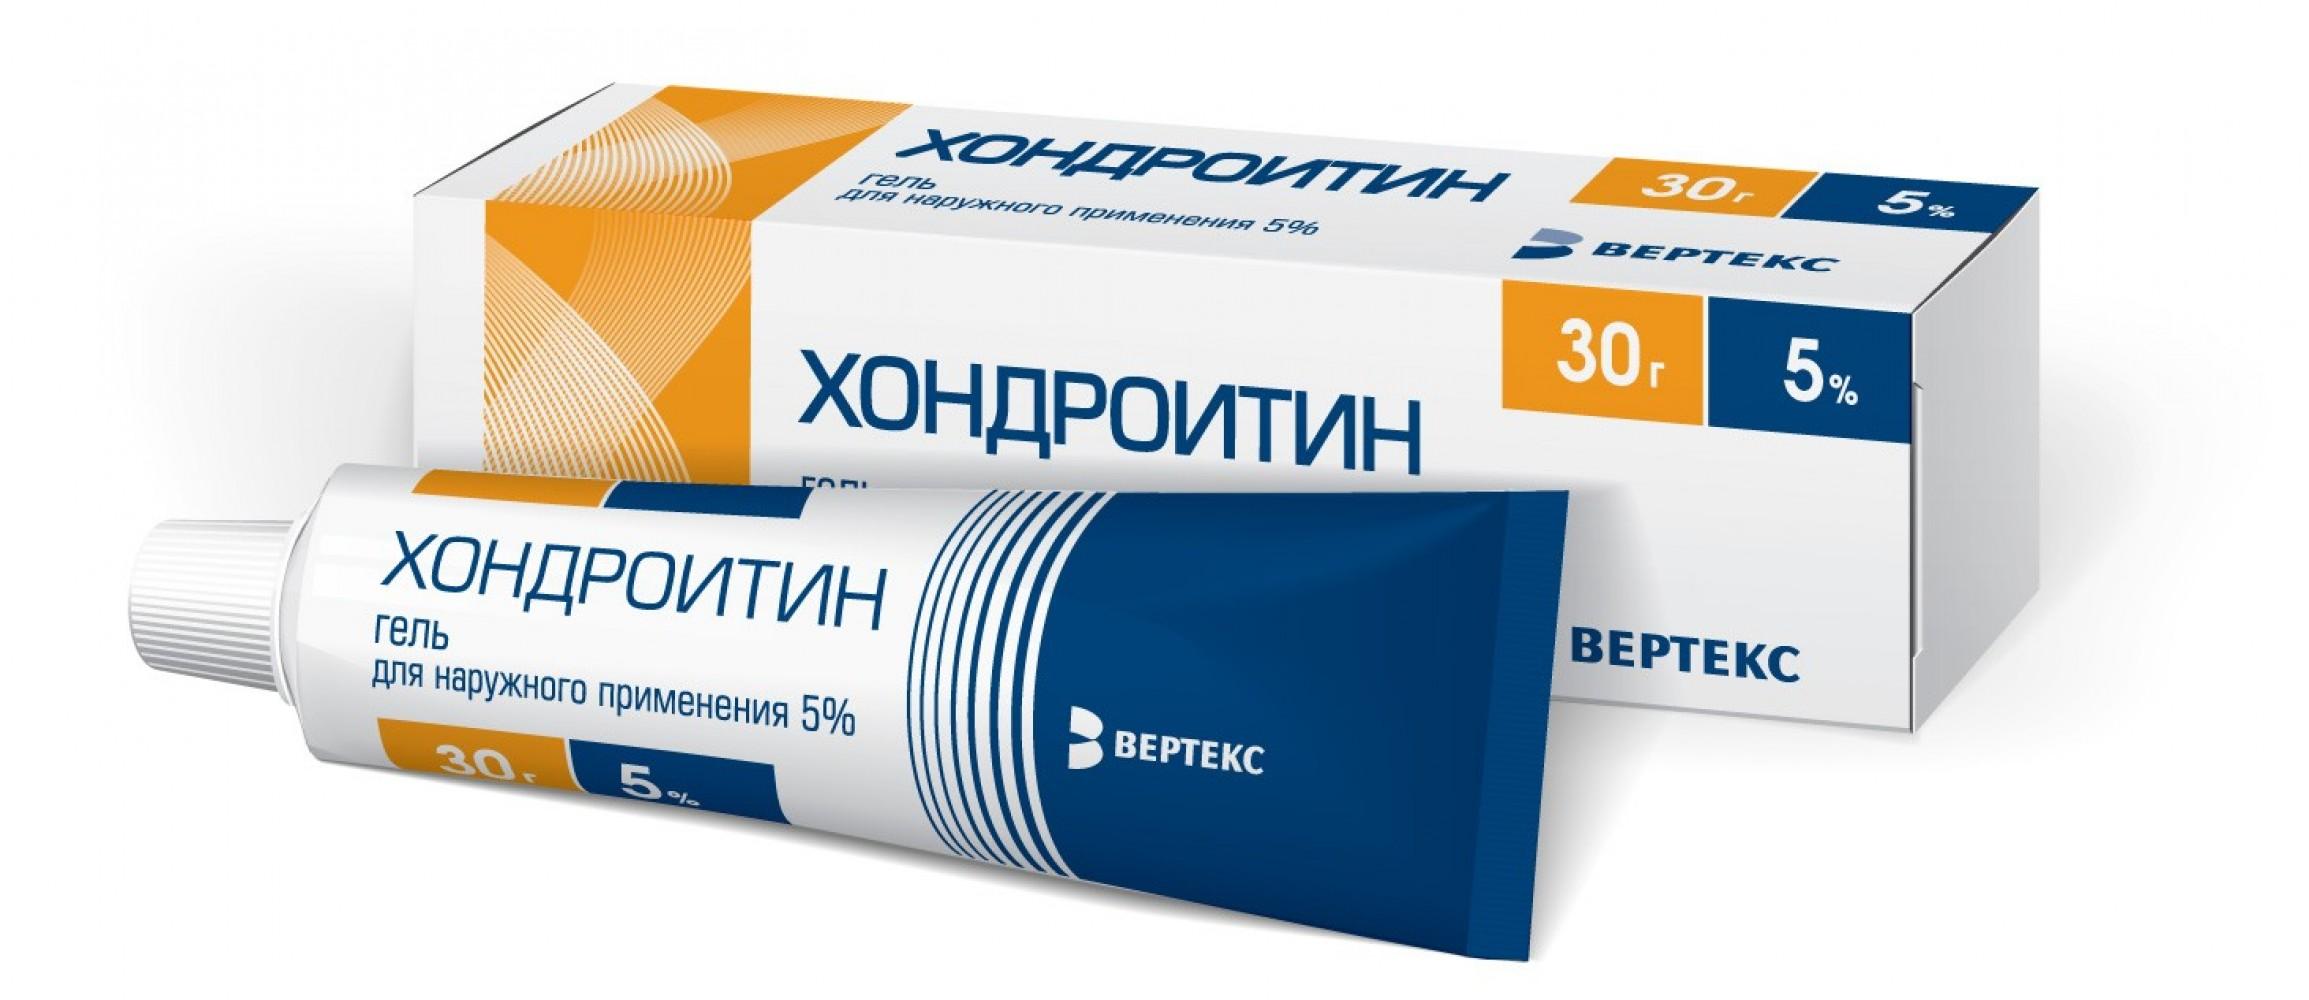 dimexid chondroitin glucosamine